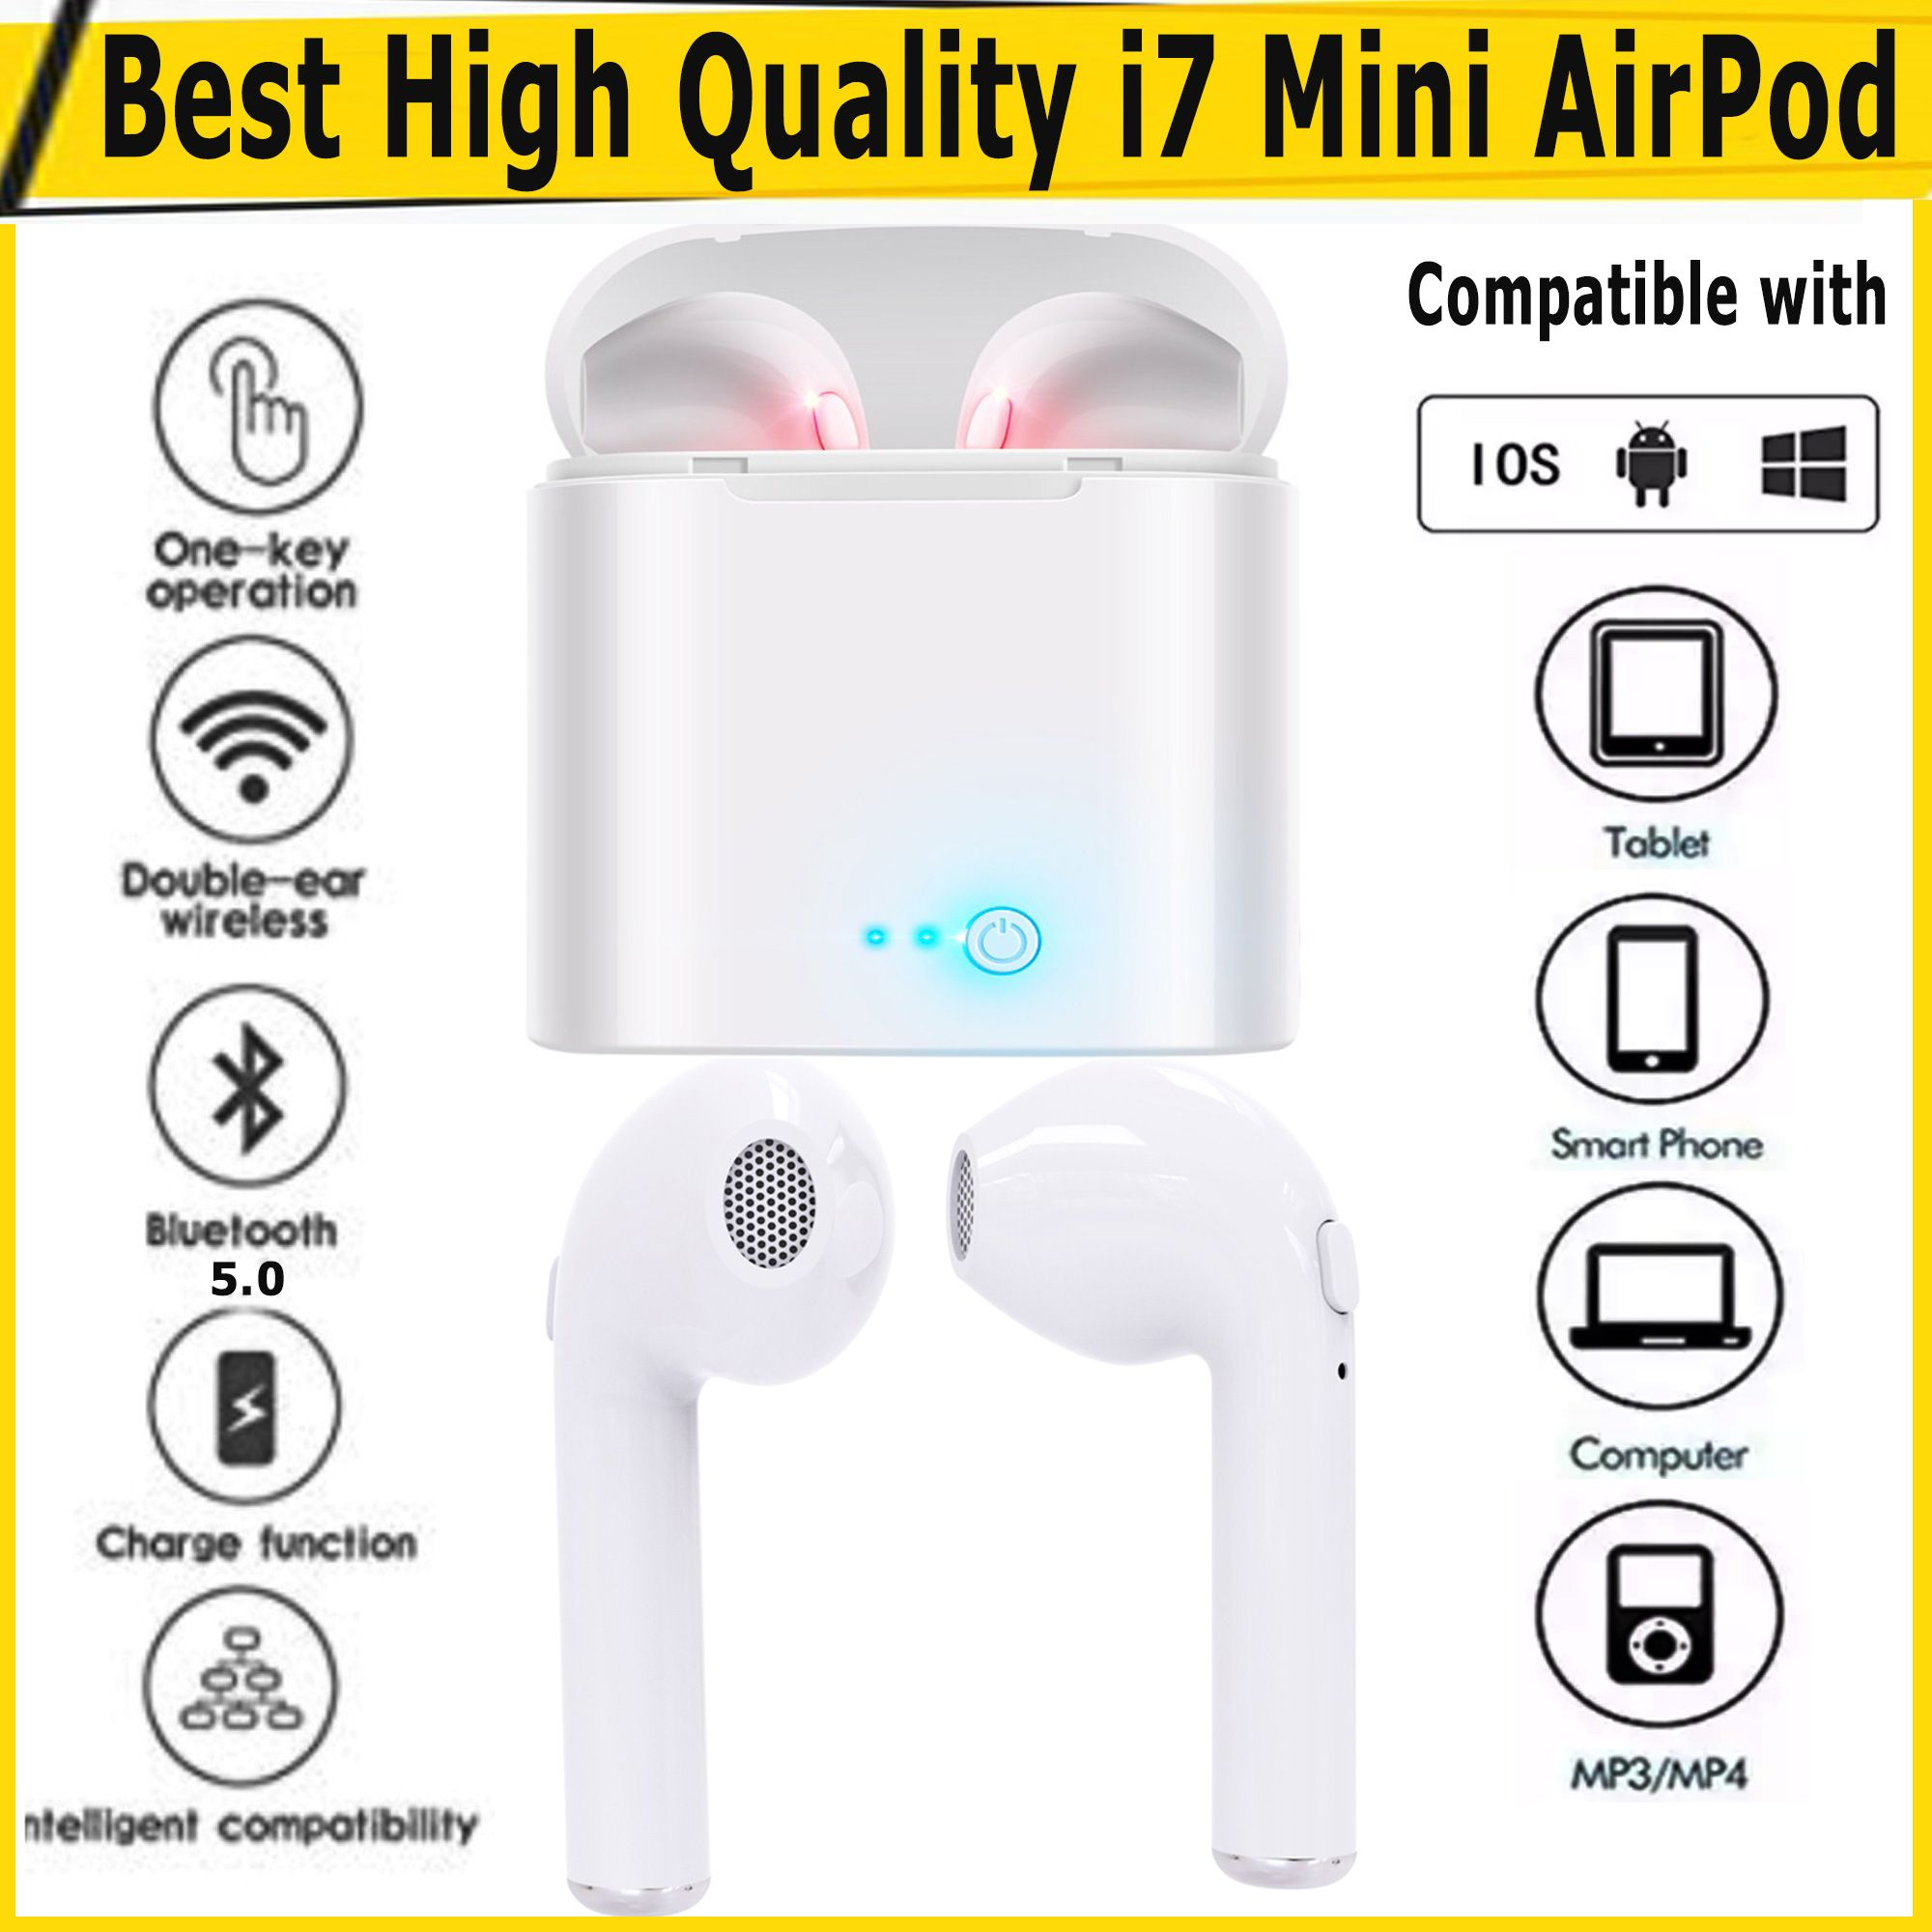 High Quality Twins I7 Mini Airpod With Charging Docks I7s Tws Mini Wireless Handfree Earbuds Earbuds Wireless Mobile Price